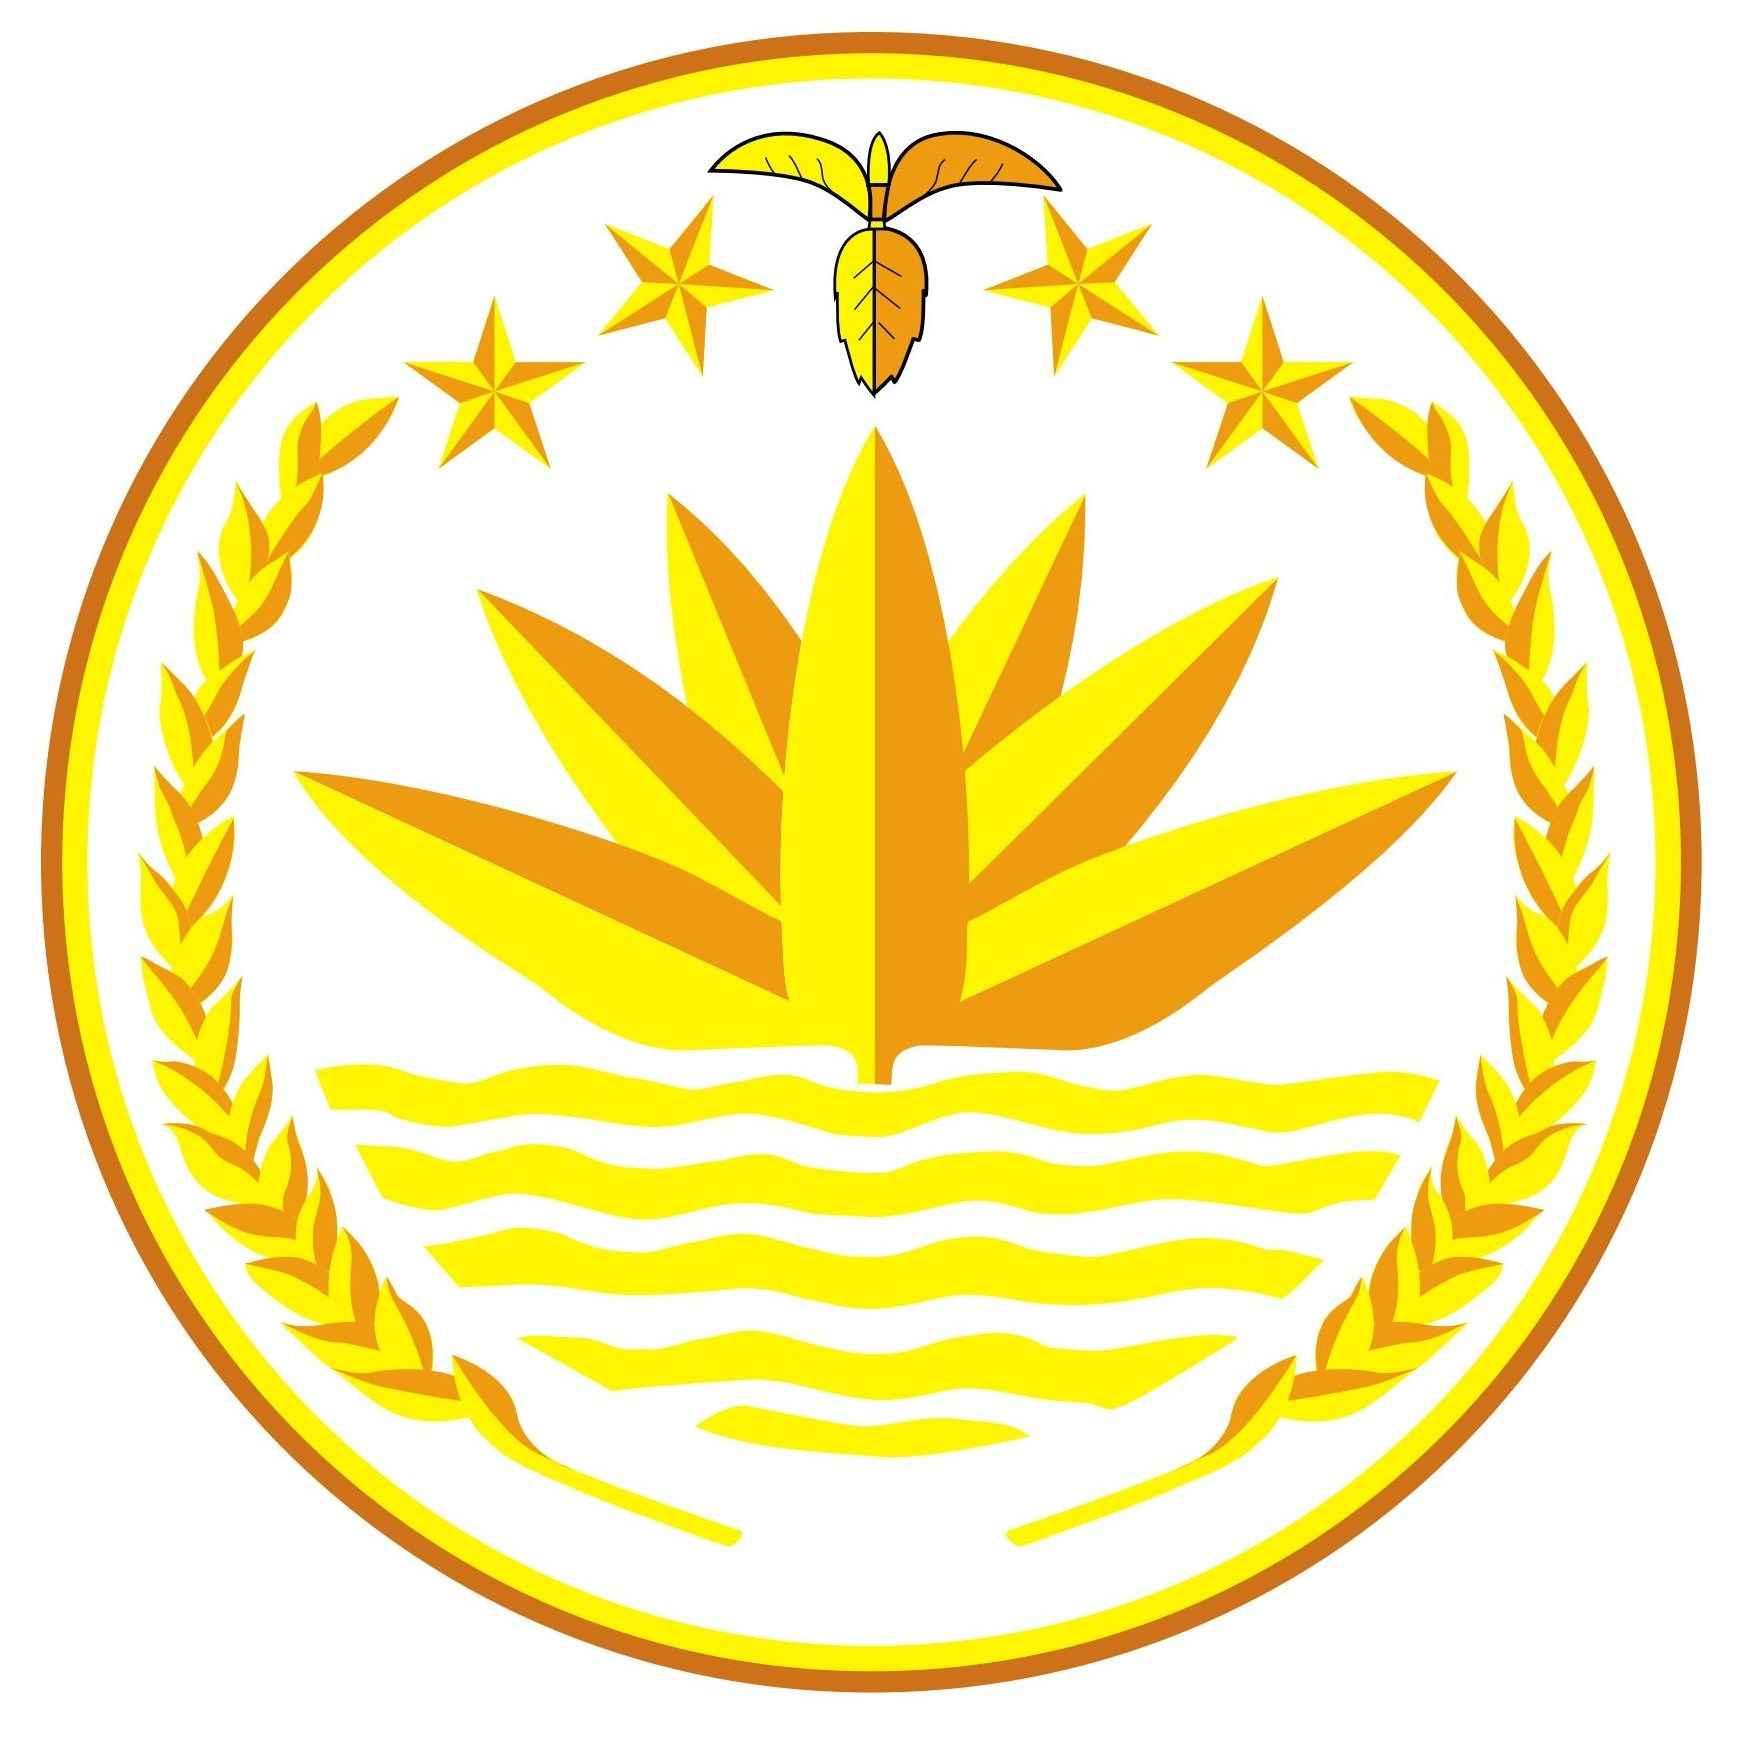 Bangladesh_National_emblem